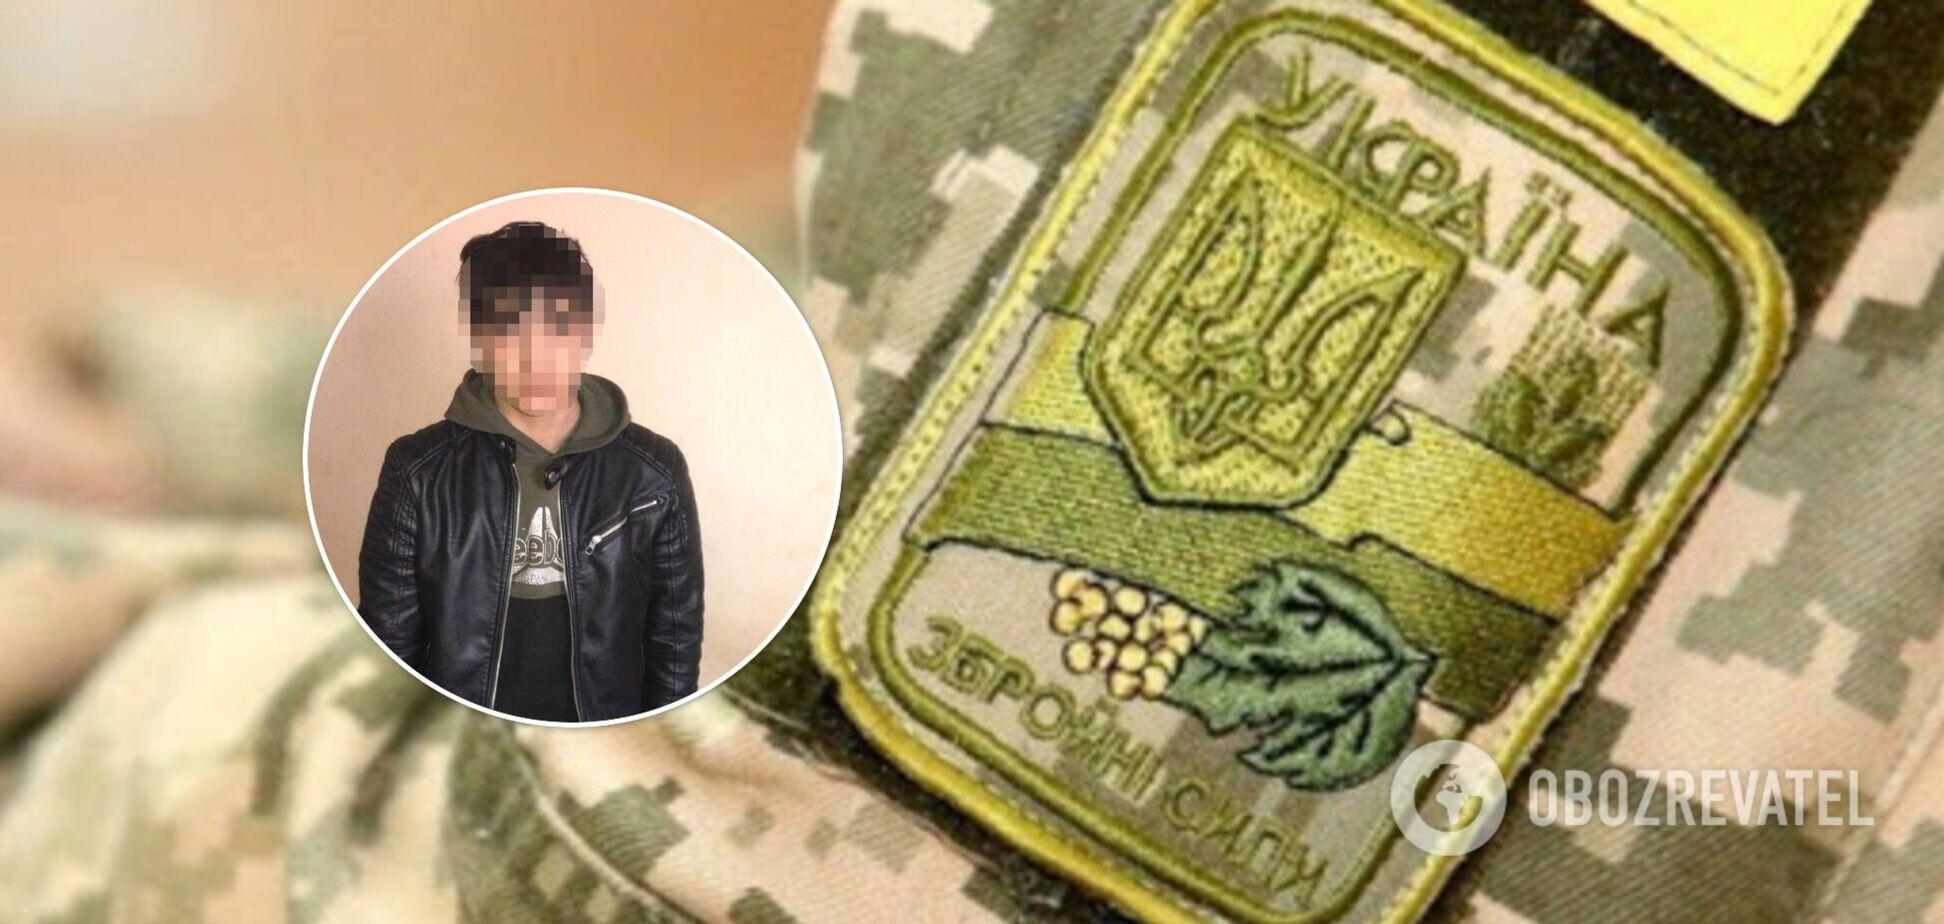 На Закарпатье подростки избили ветерана АТО. Фото и видео